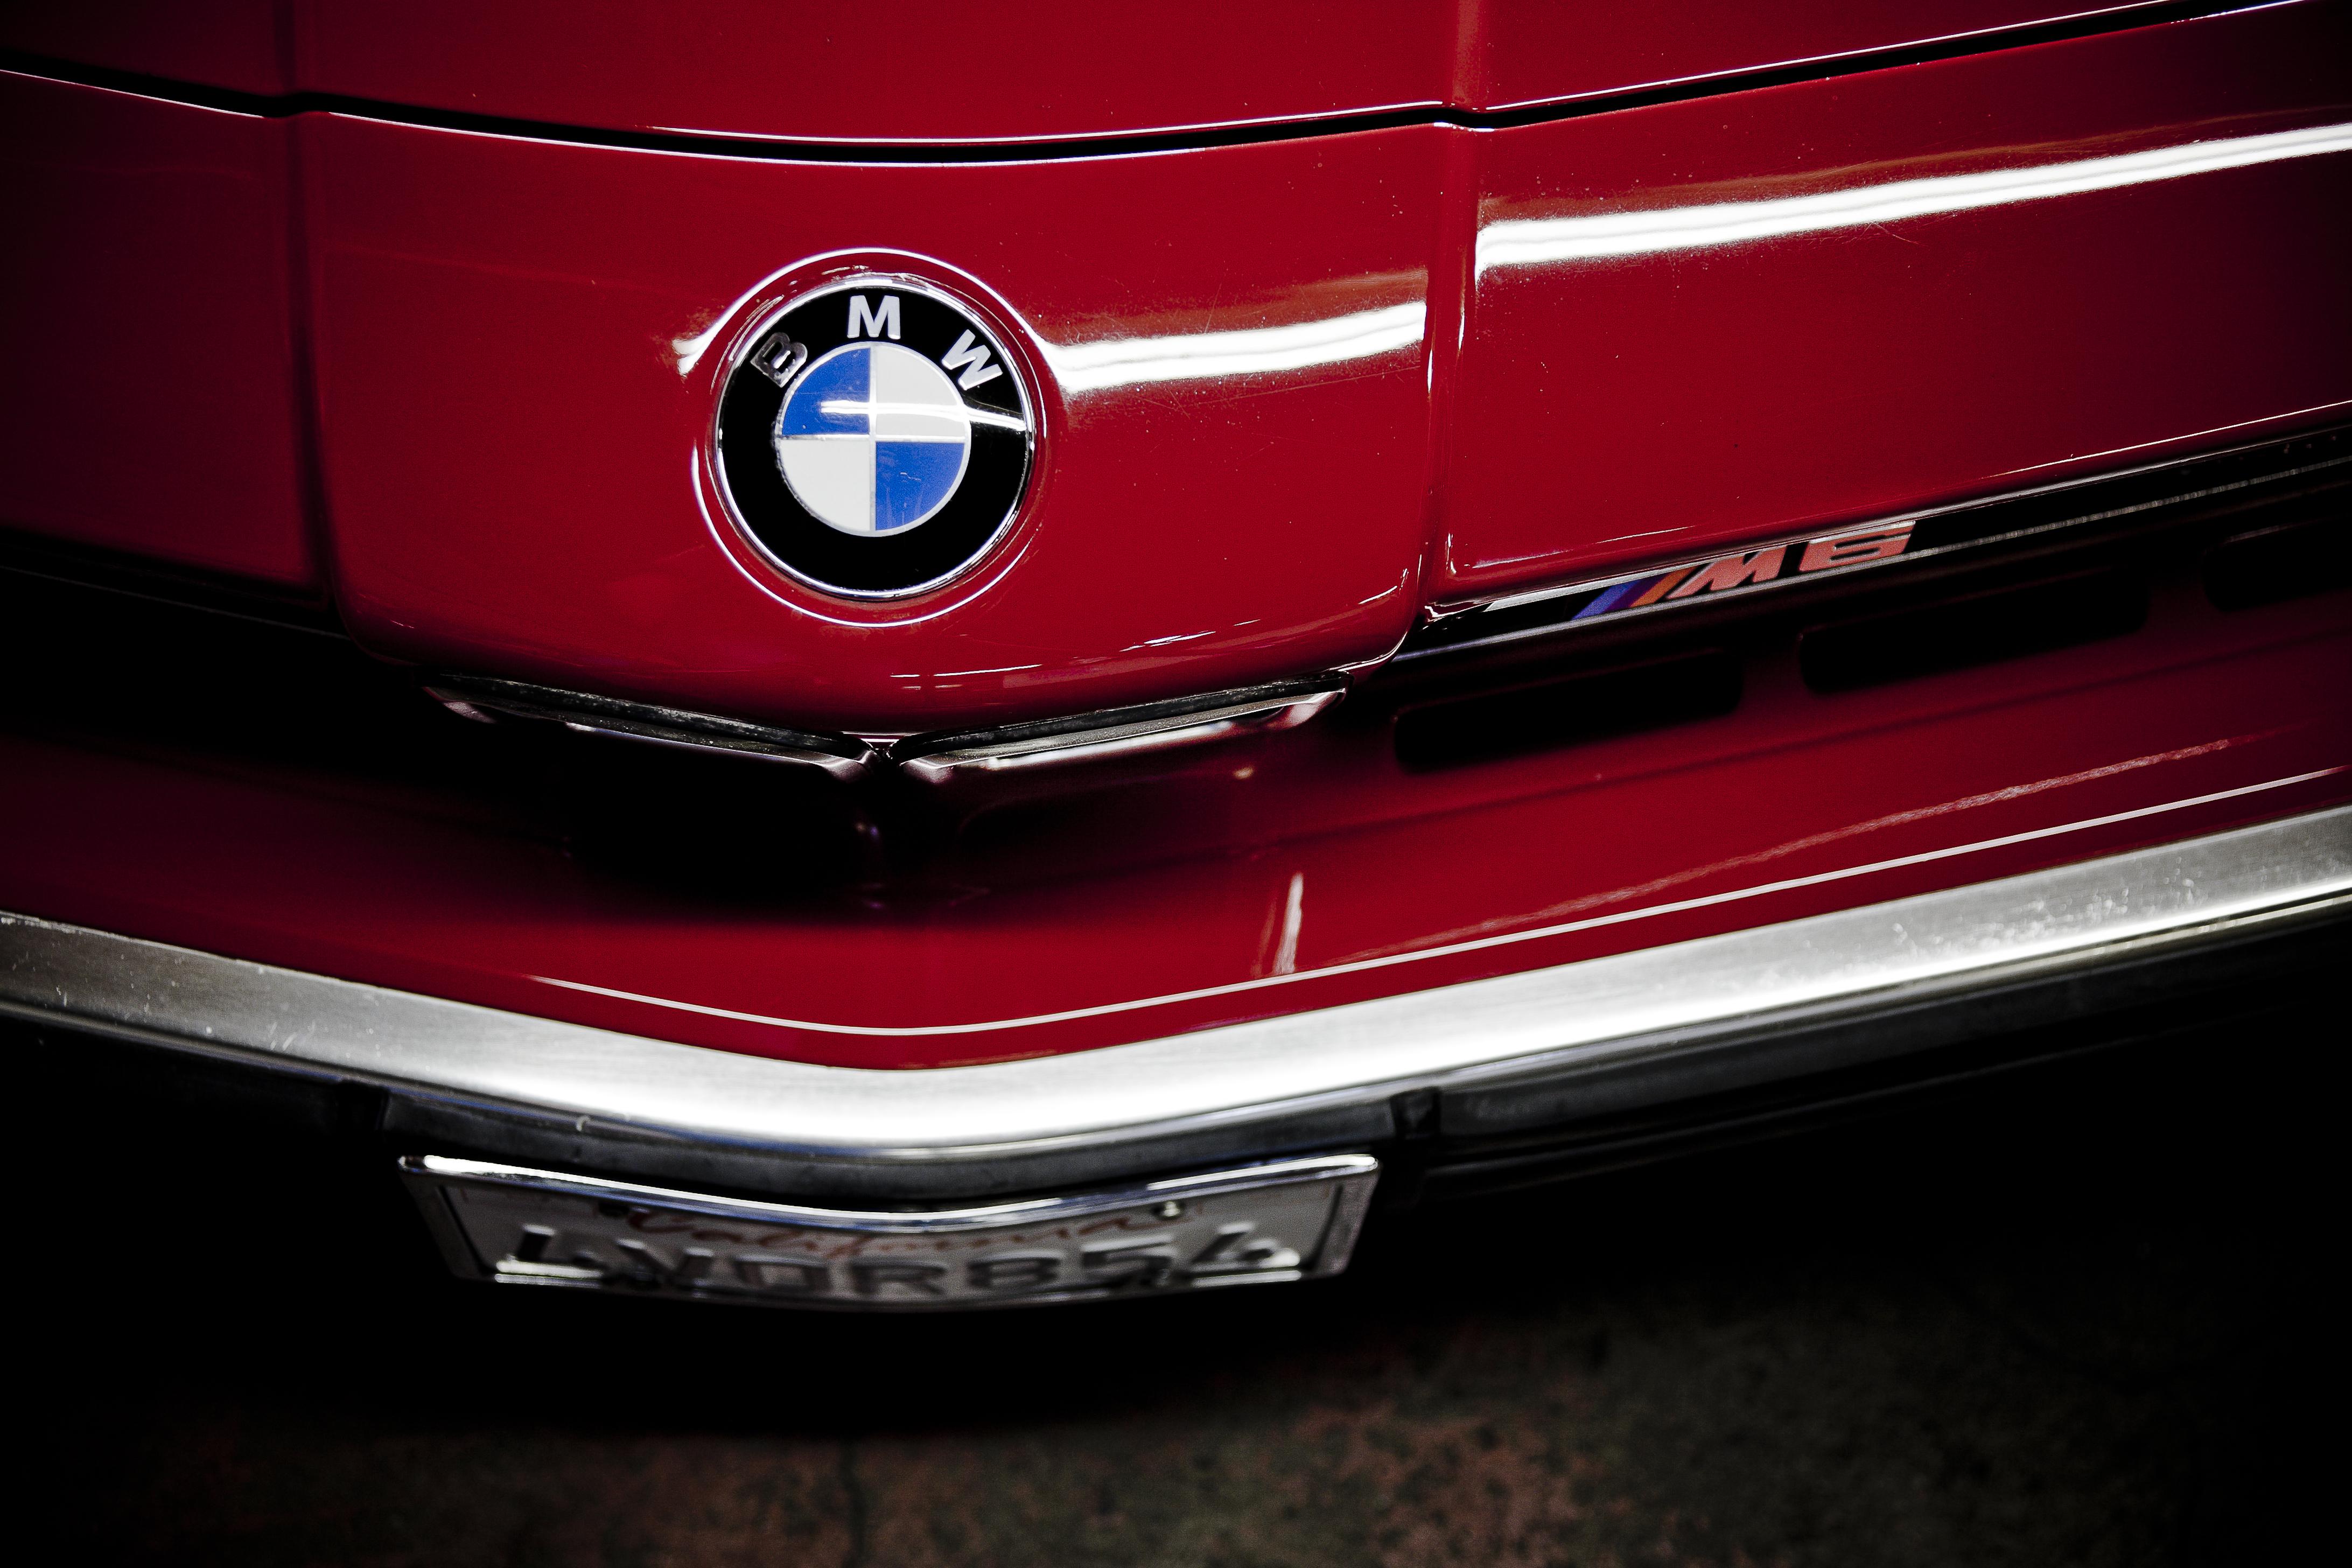 Auto Dynamik of San Francisco, CA | European Auto Repair | BMW, VW, Audi, Mini & Subaru Service